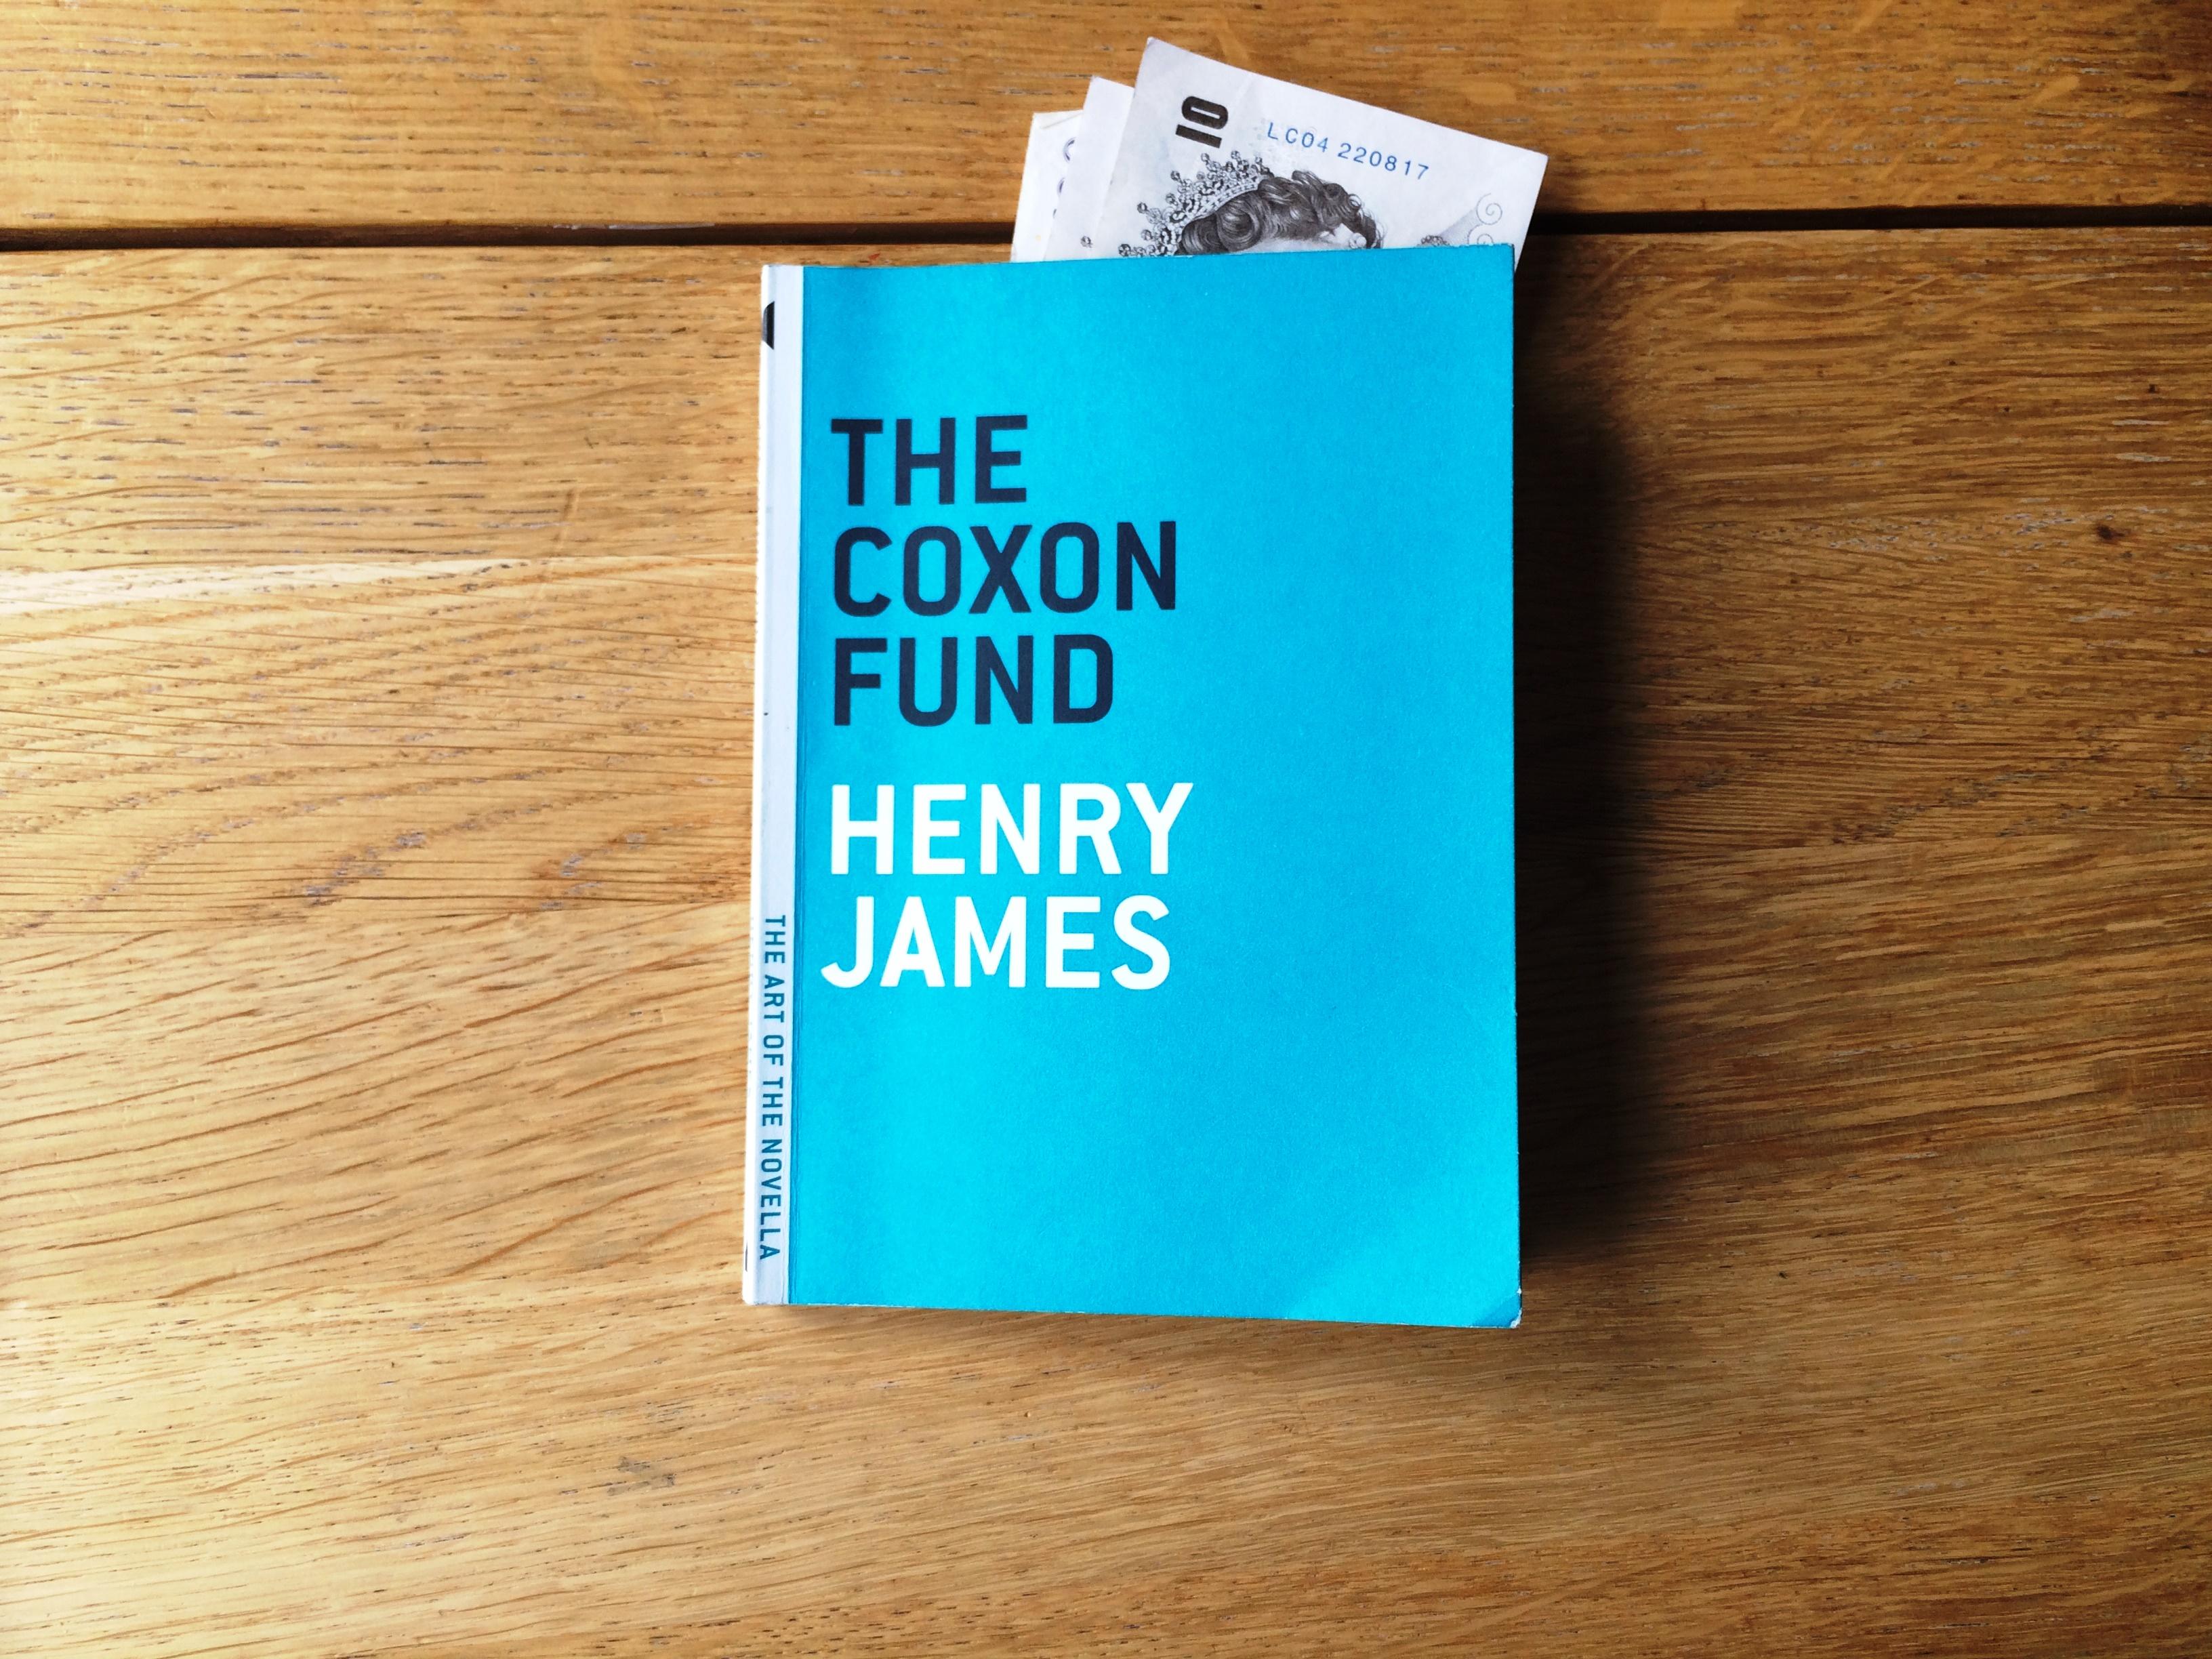 The Art of the Novella challenge 15: The Coxon Fund